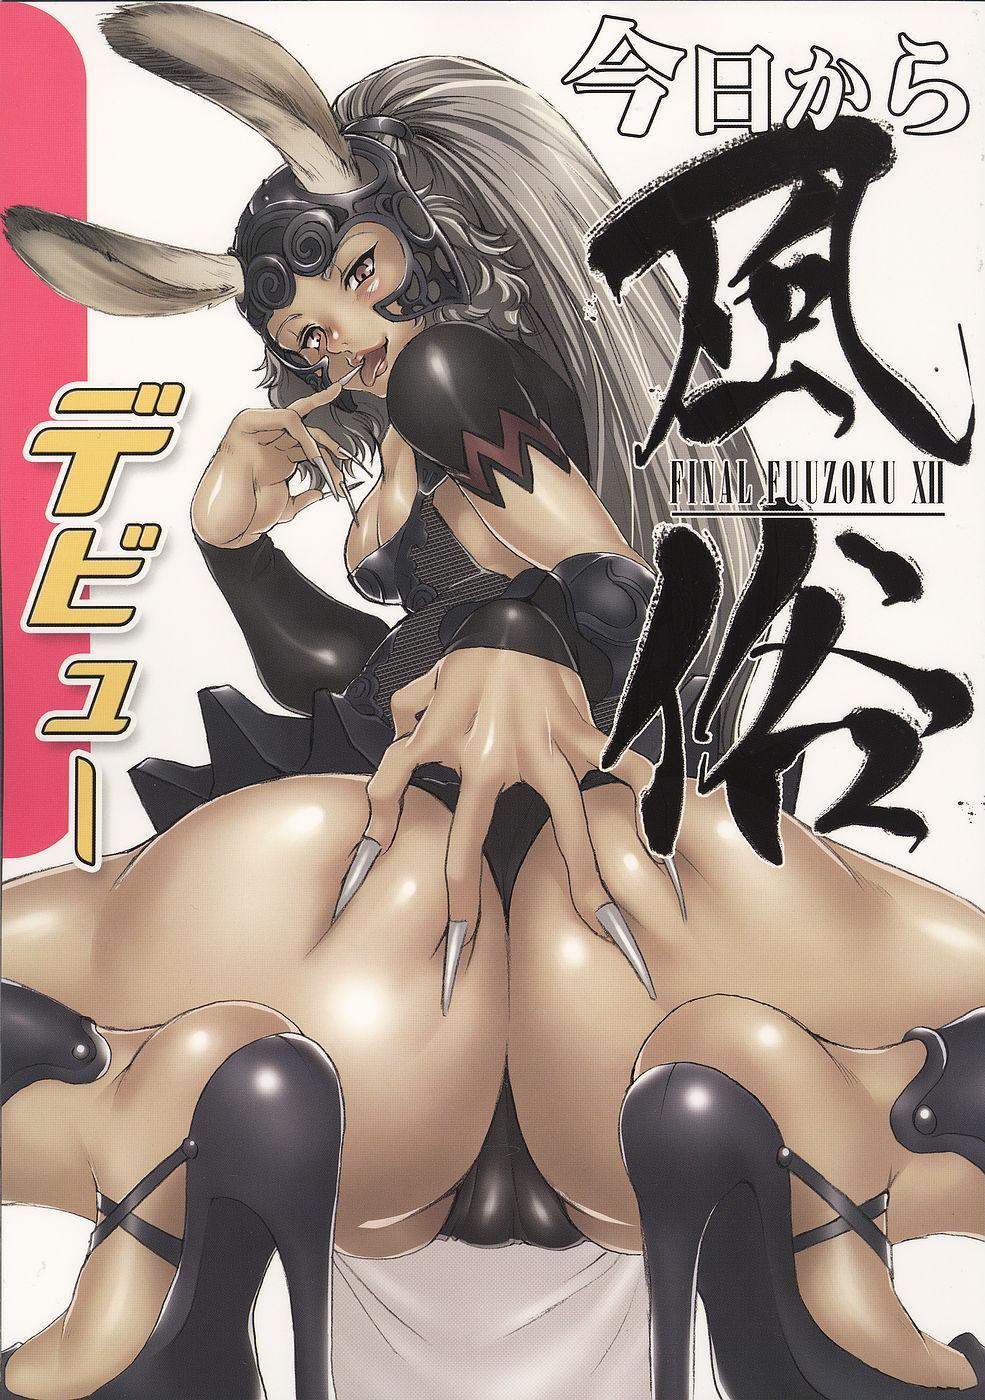 Kyou Kara Fuuzoku Debut   Today's the Debut of Sex Service 0